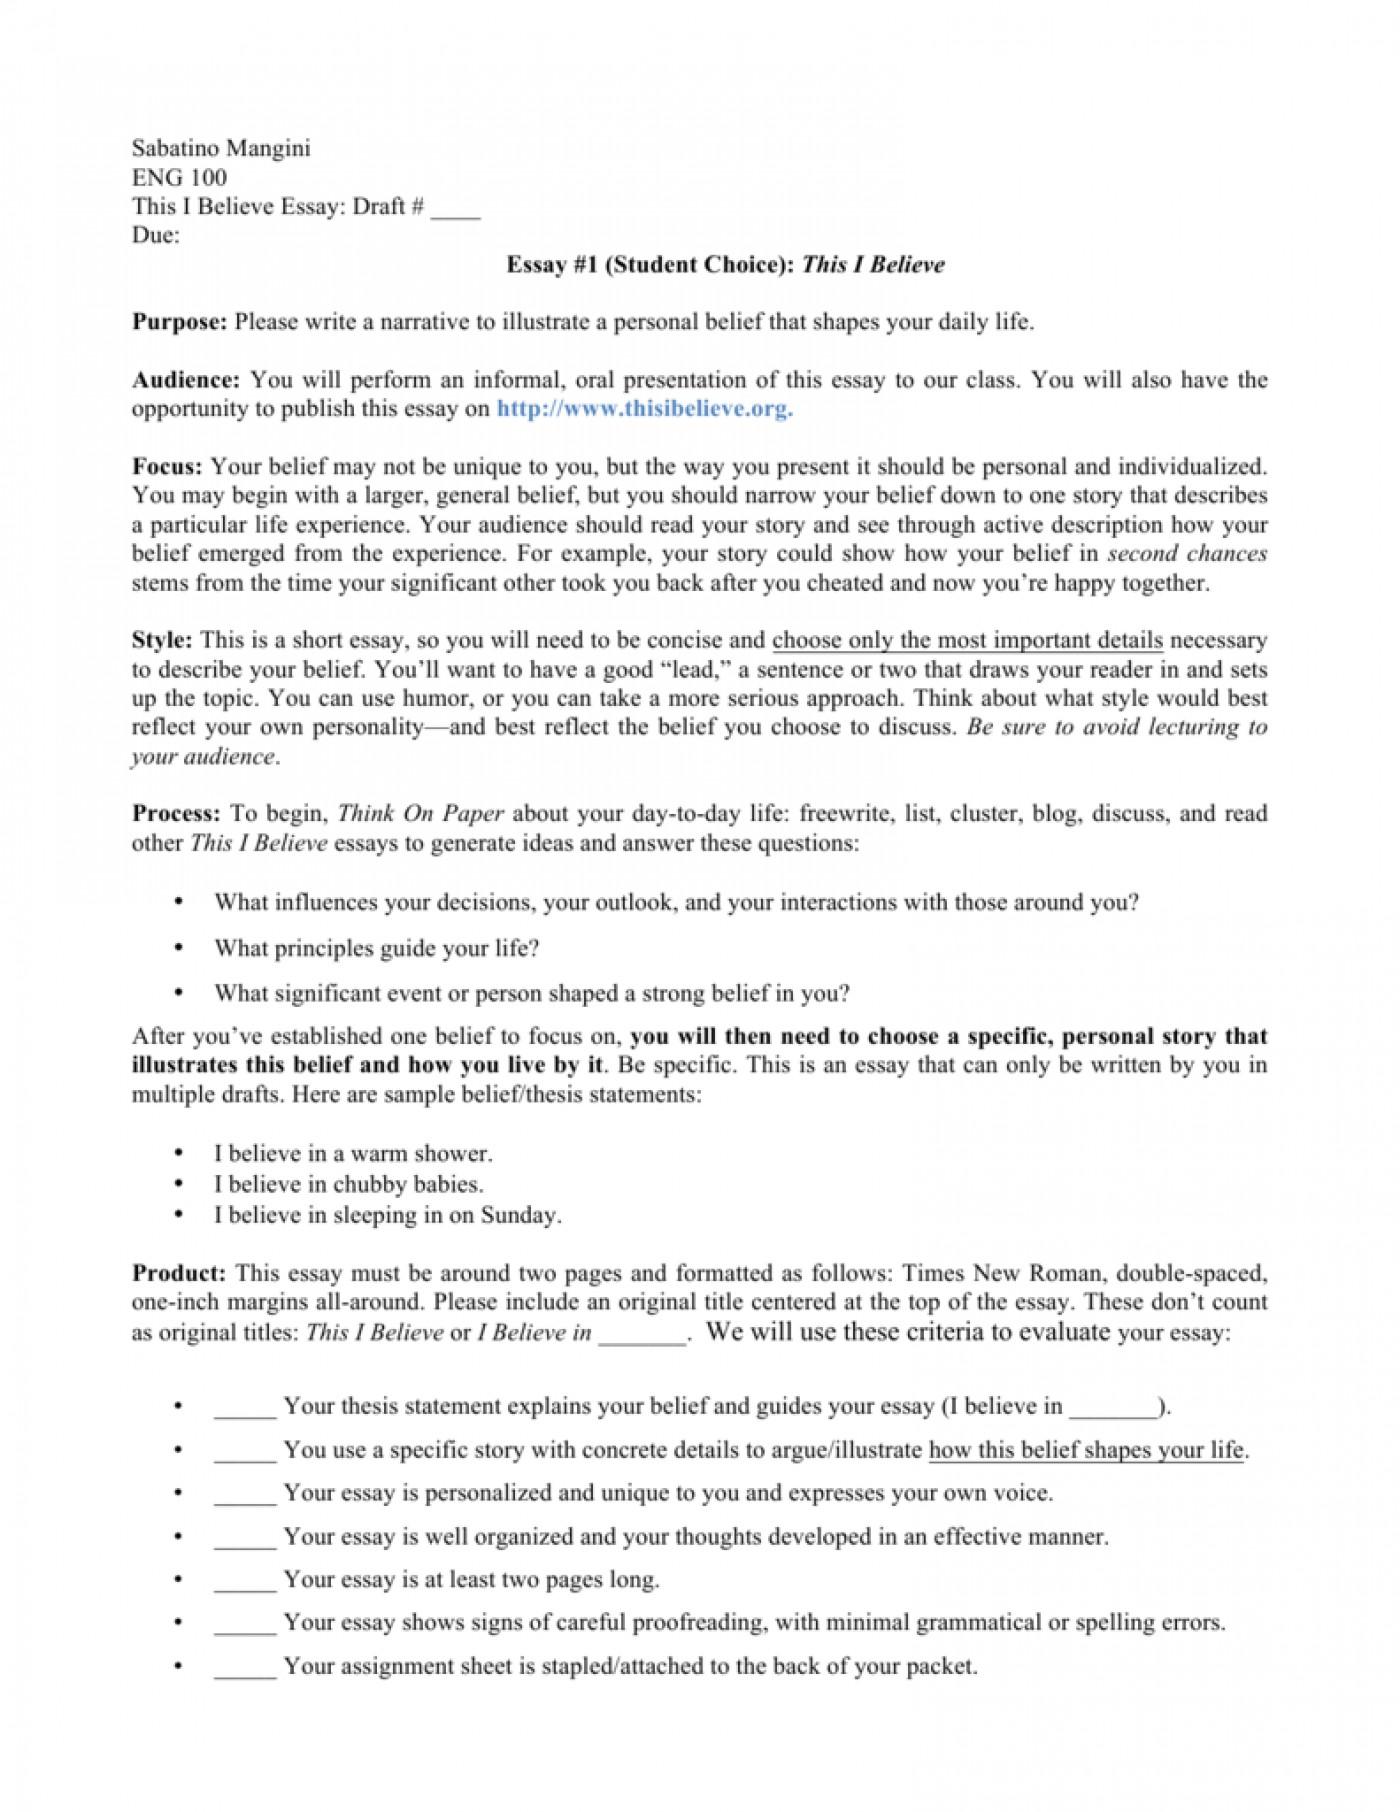 007 008807227 1 I Belive Essays Essay Surprising Believe About Sports Ideas 1400